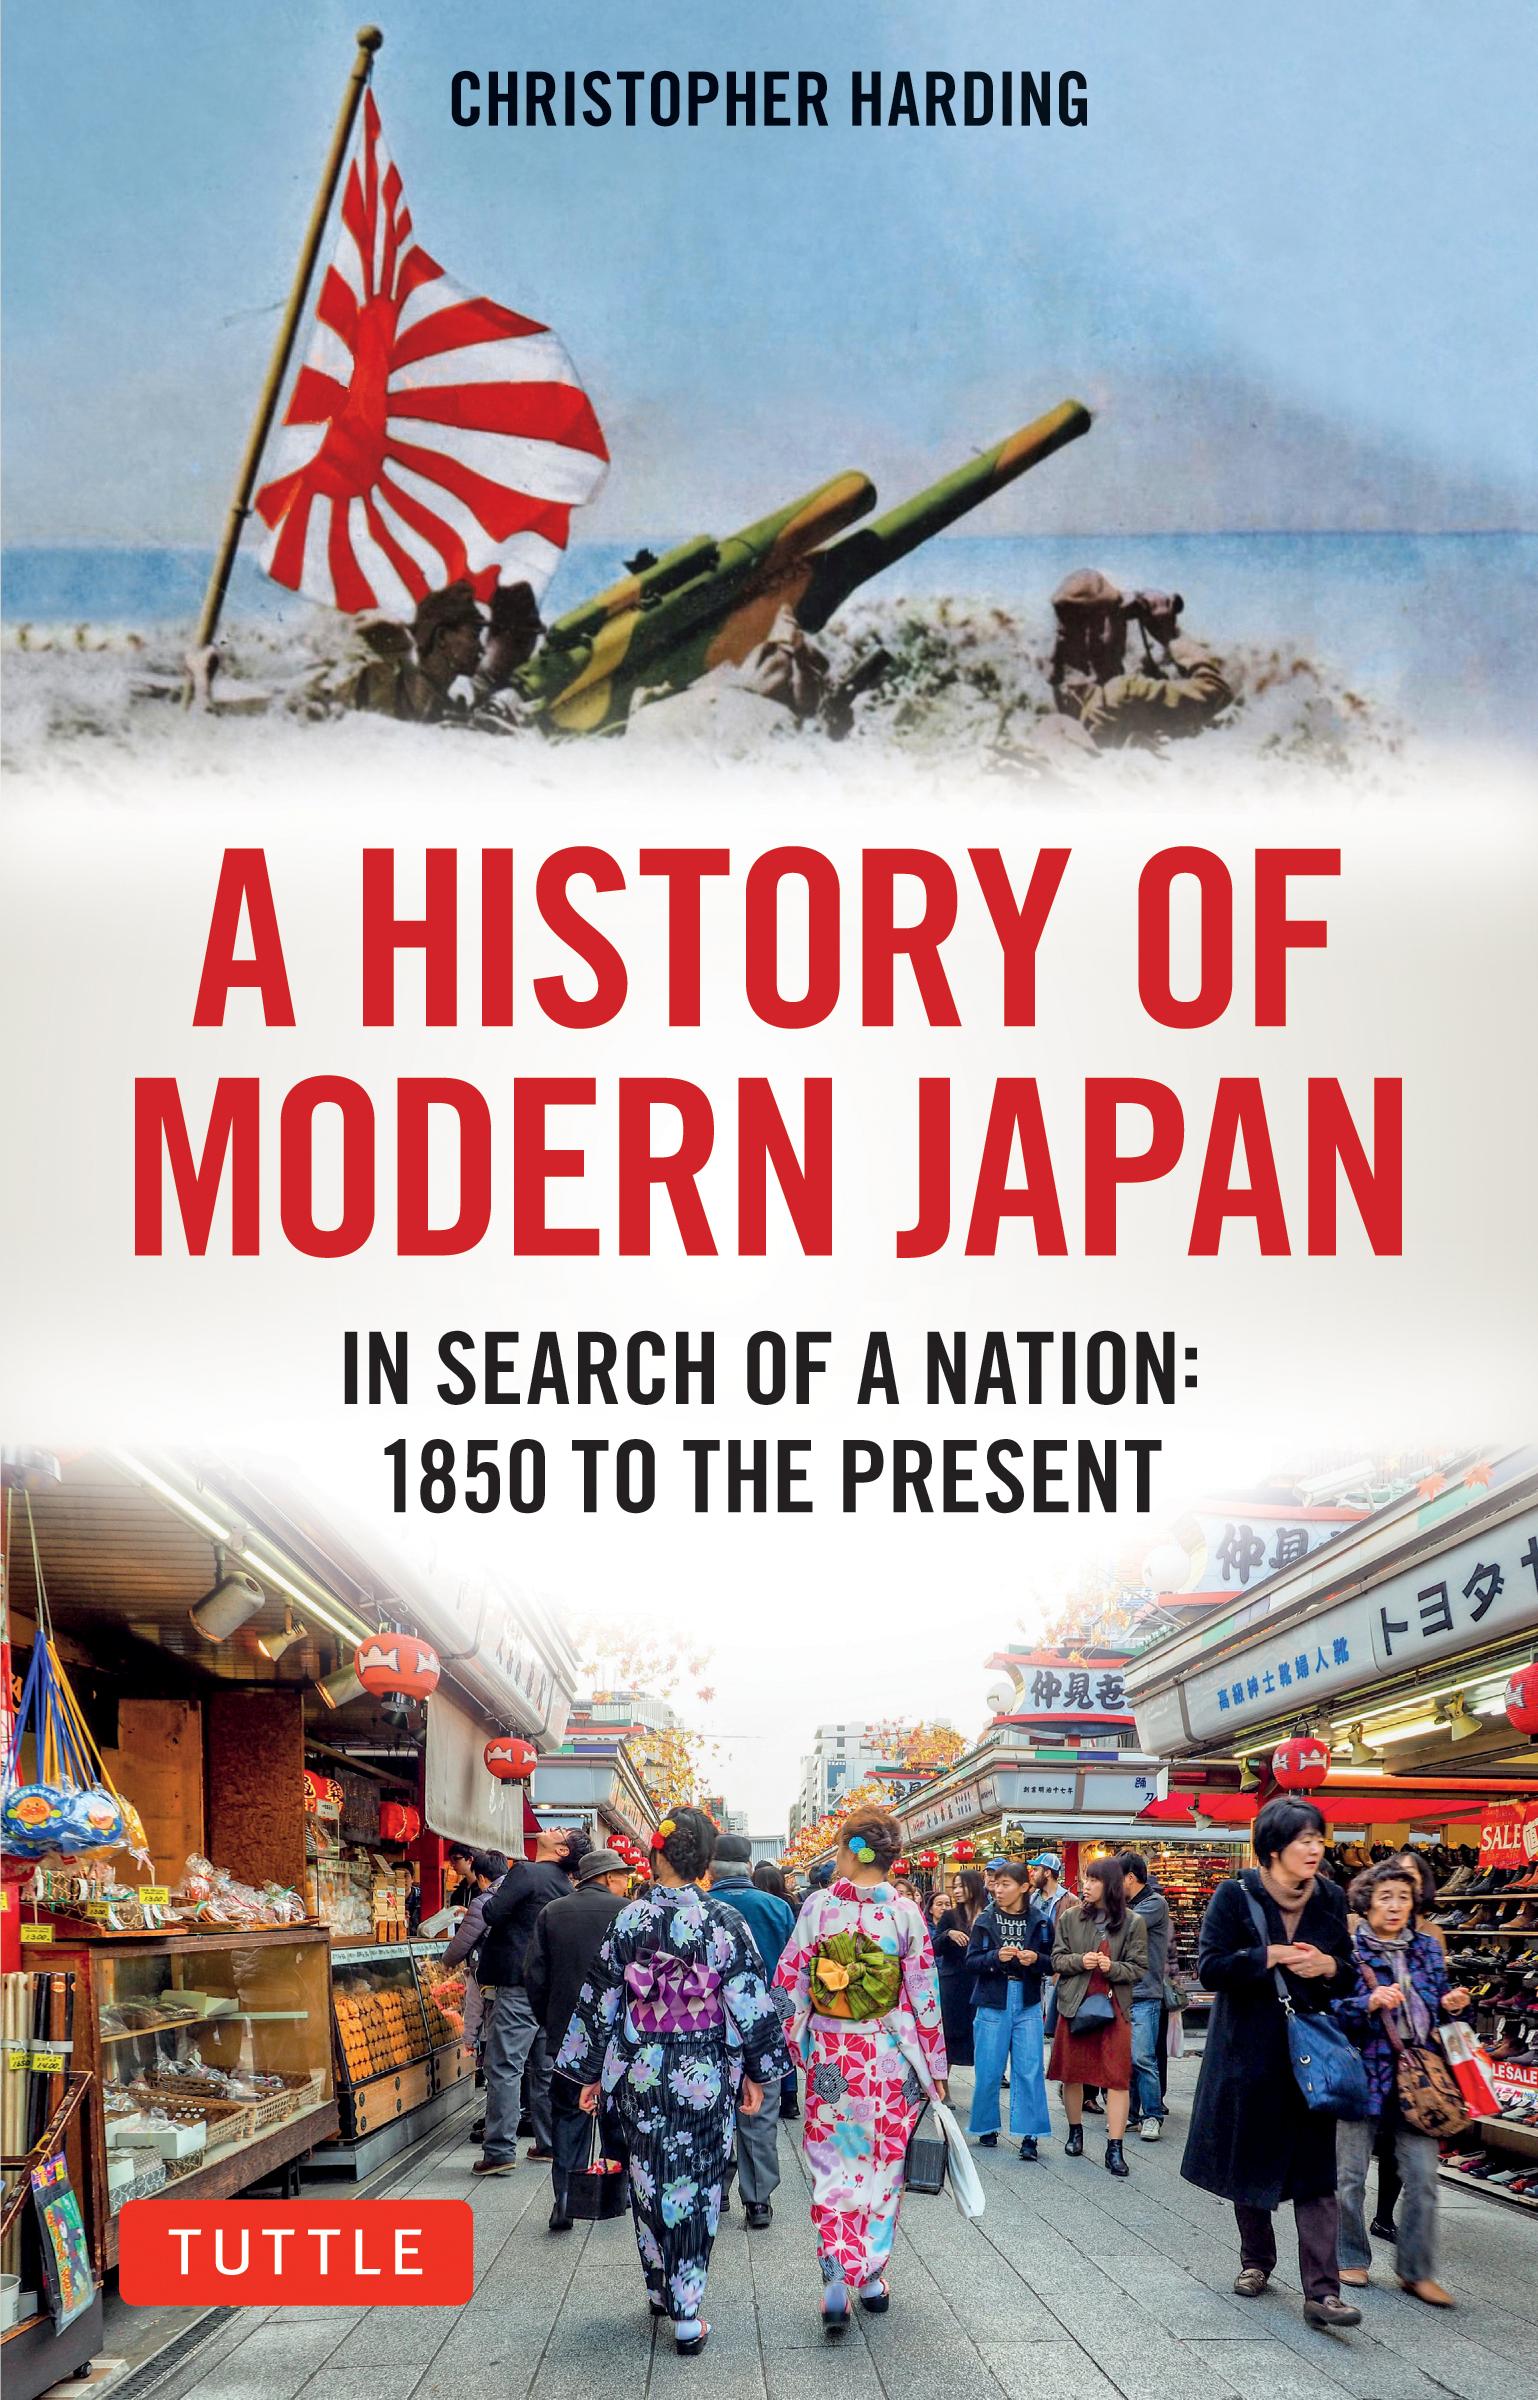 A History of Modern Japan